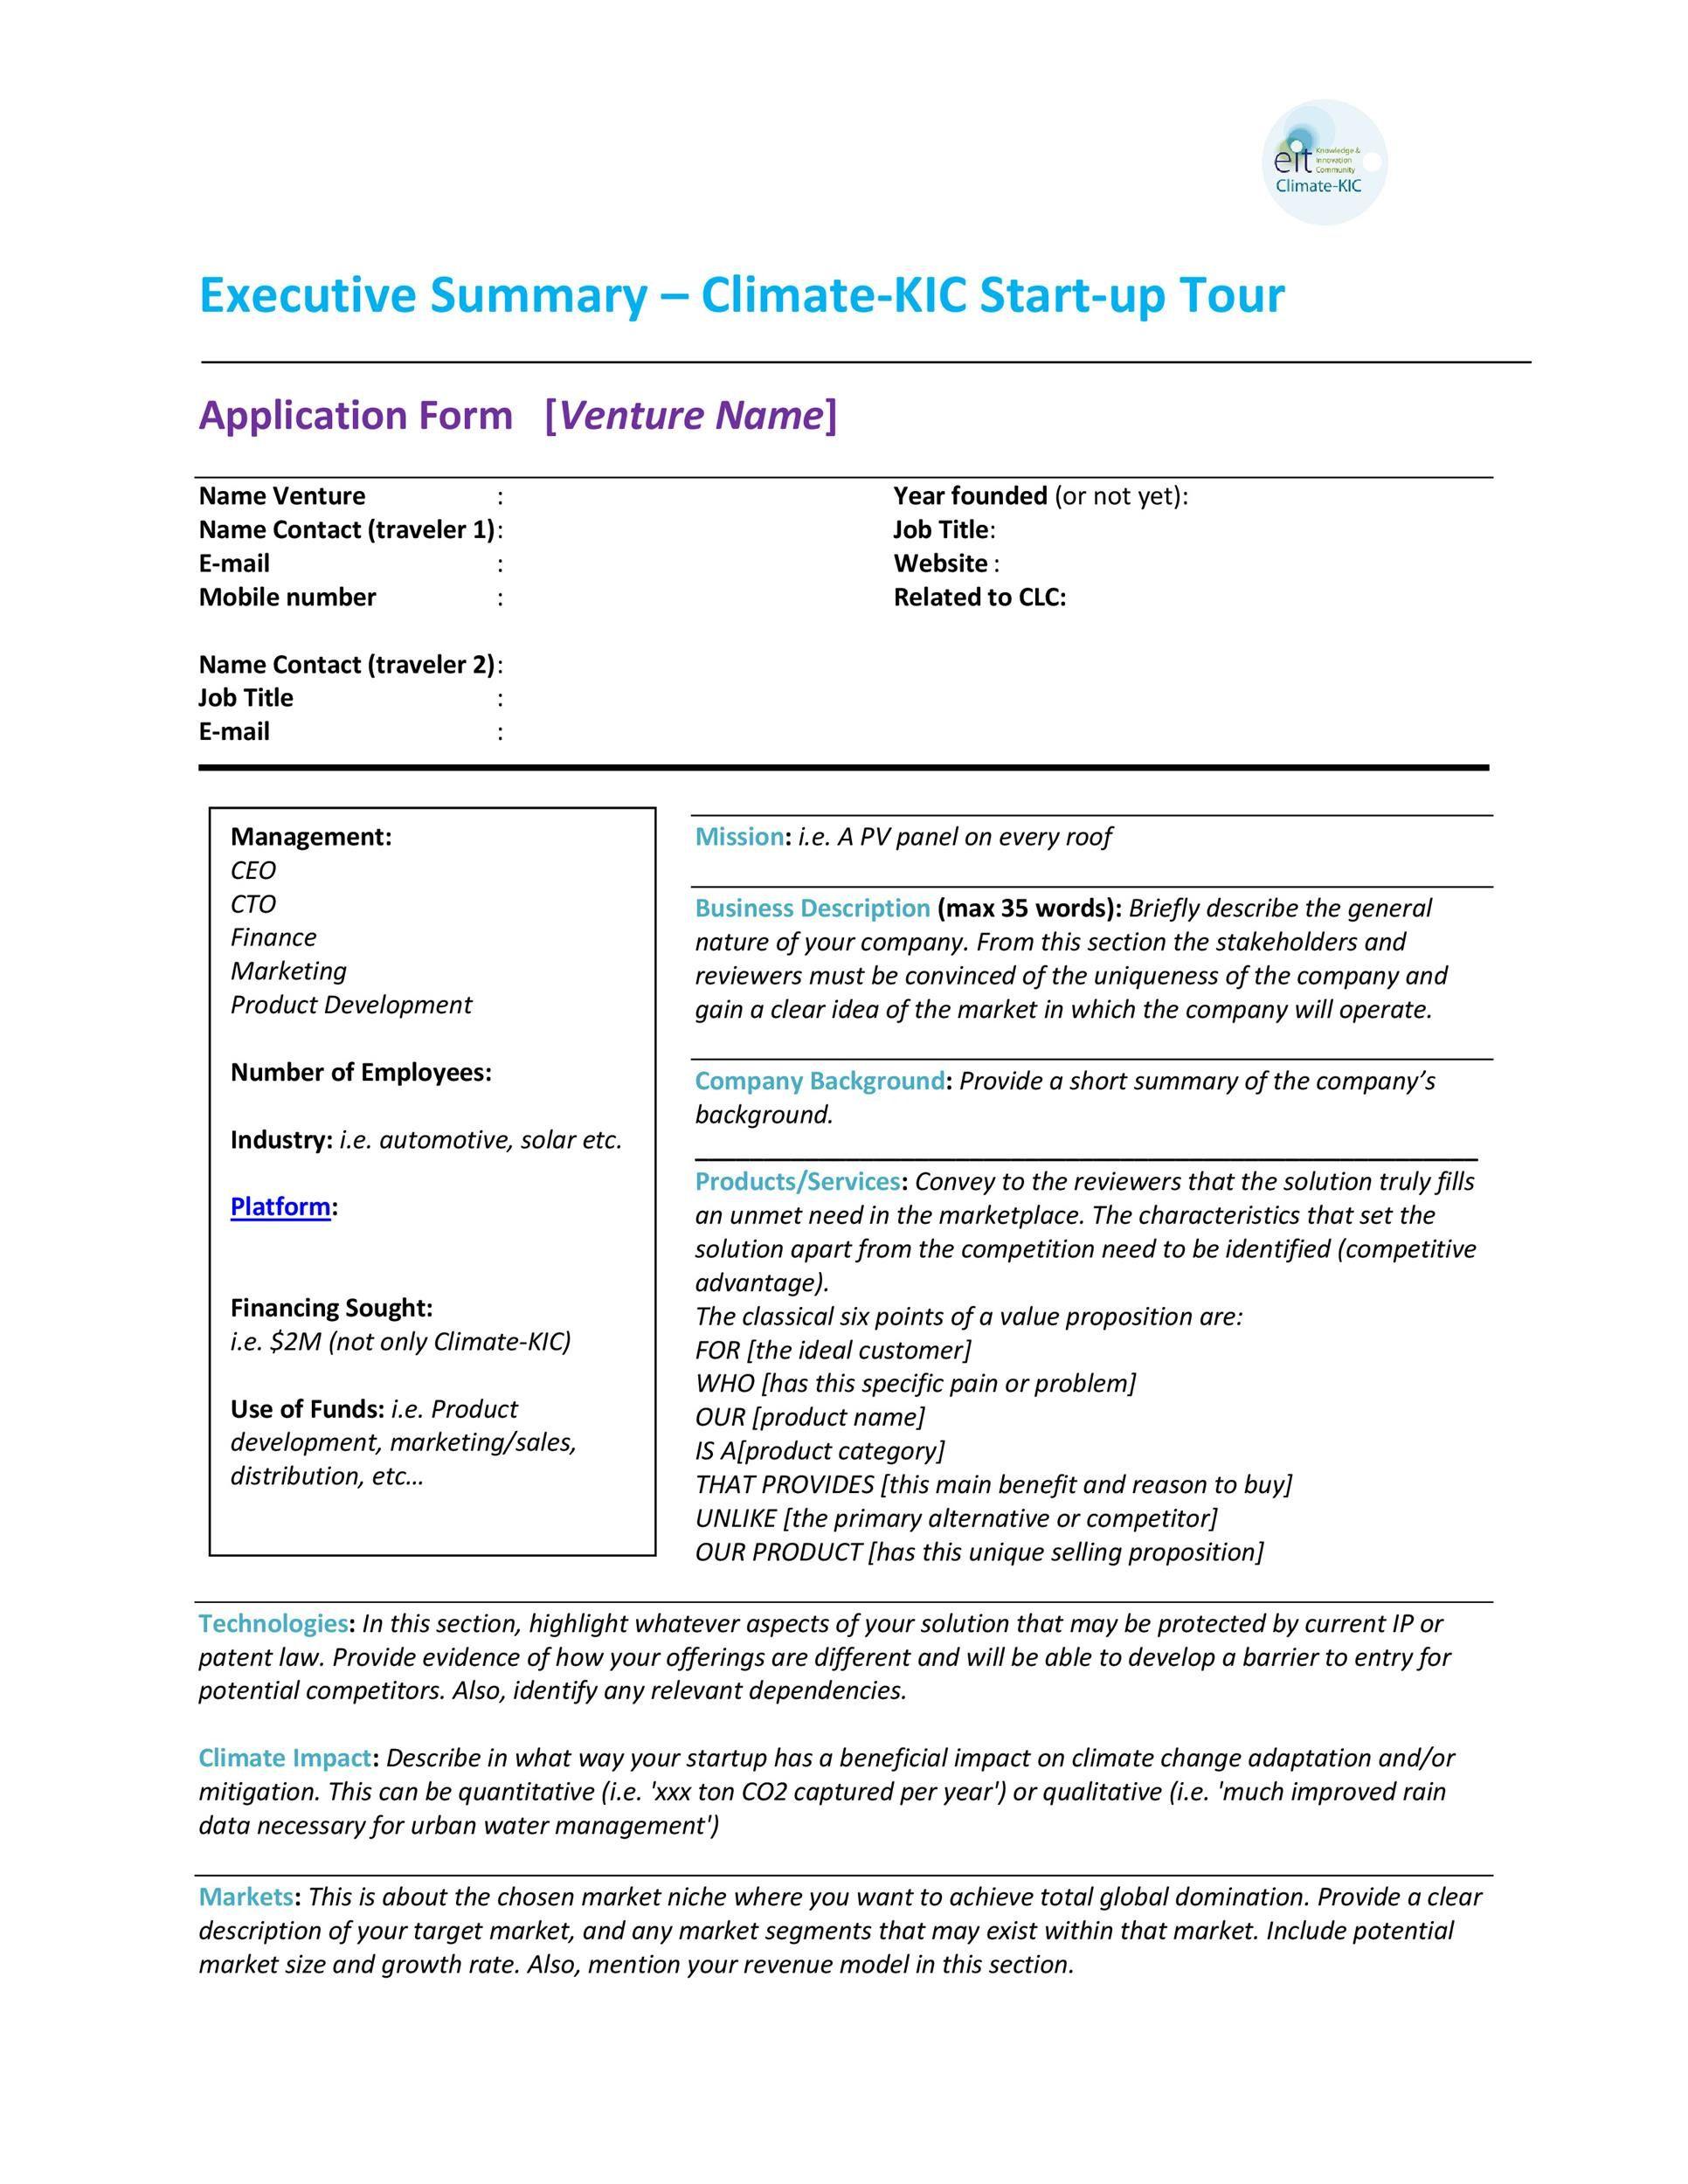 006 Incredible Executive Summary Template Word Free Idea Full